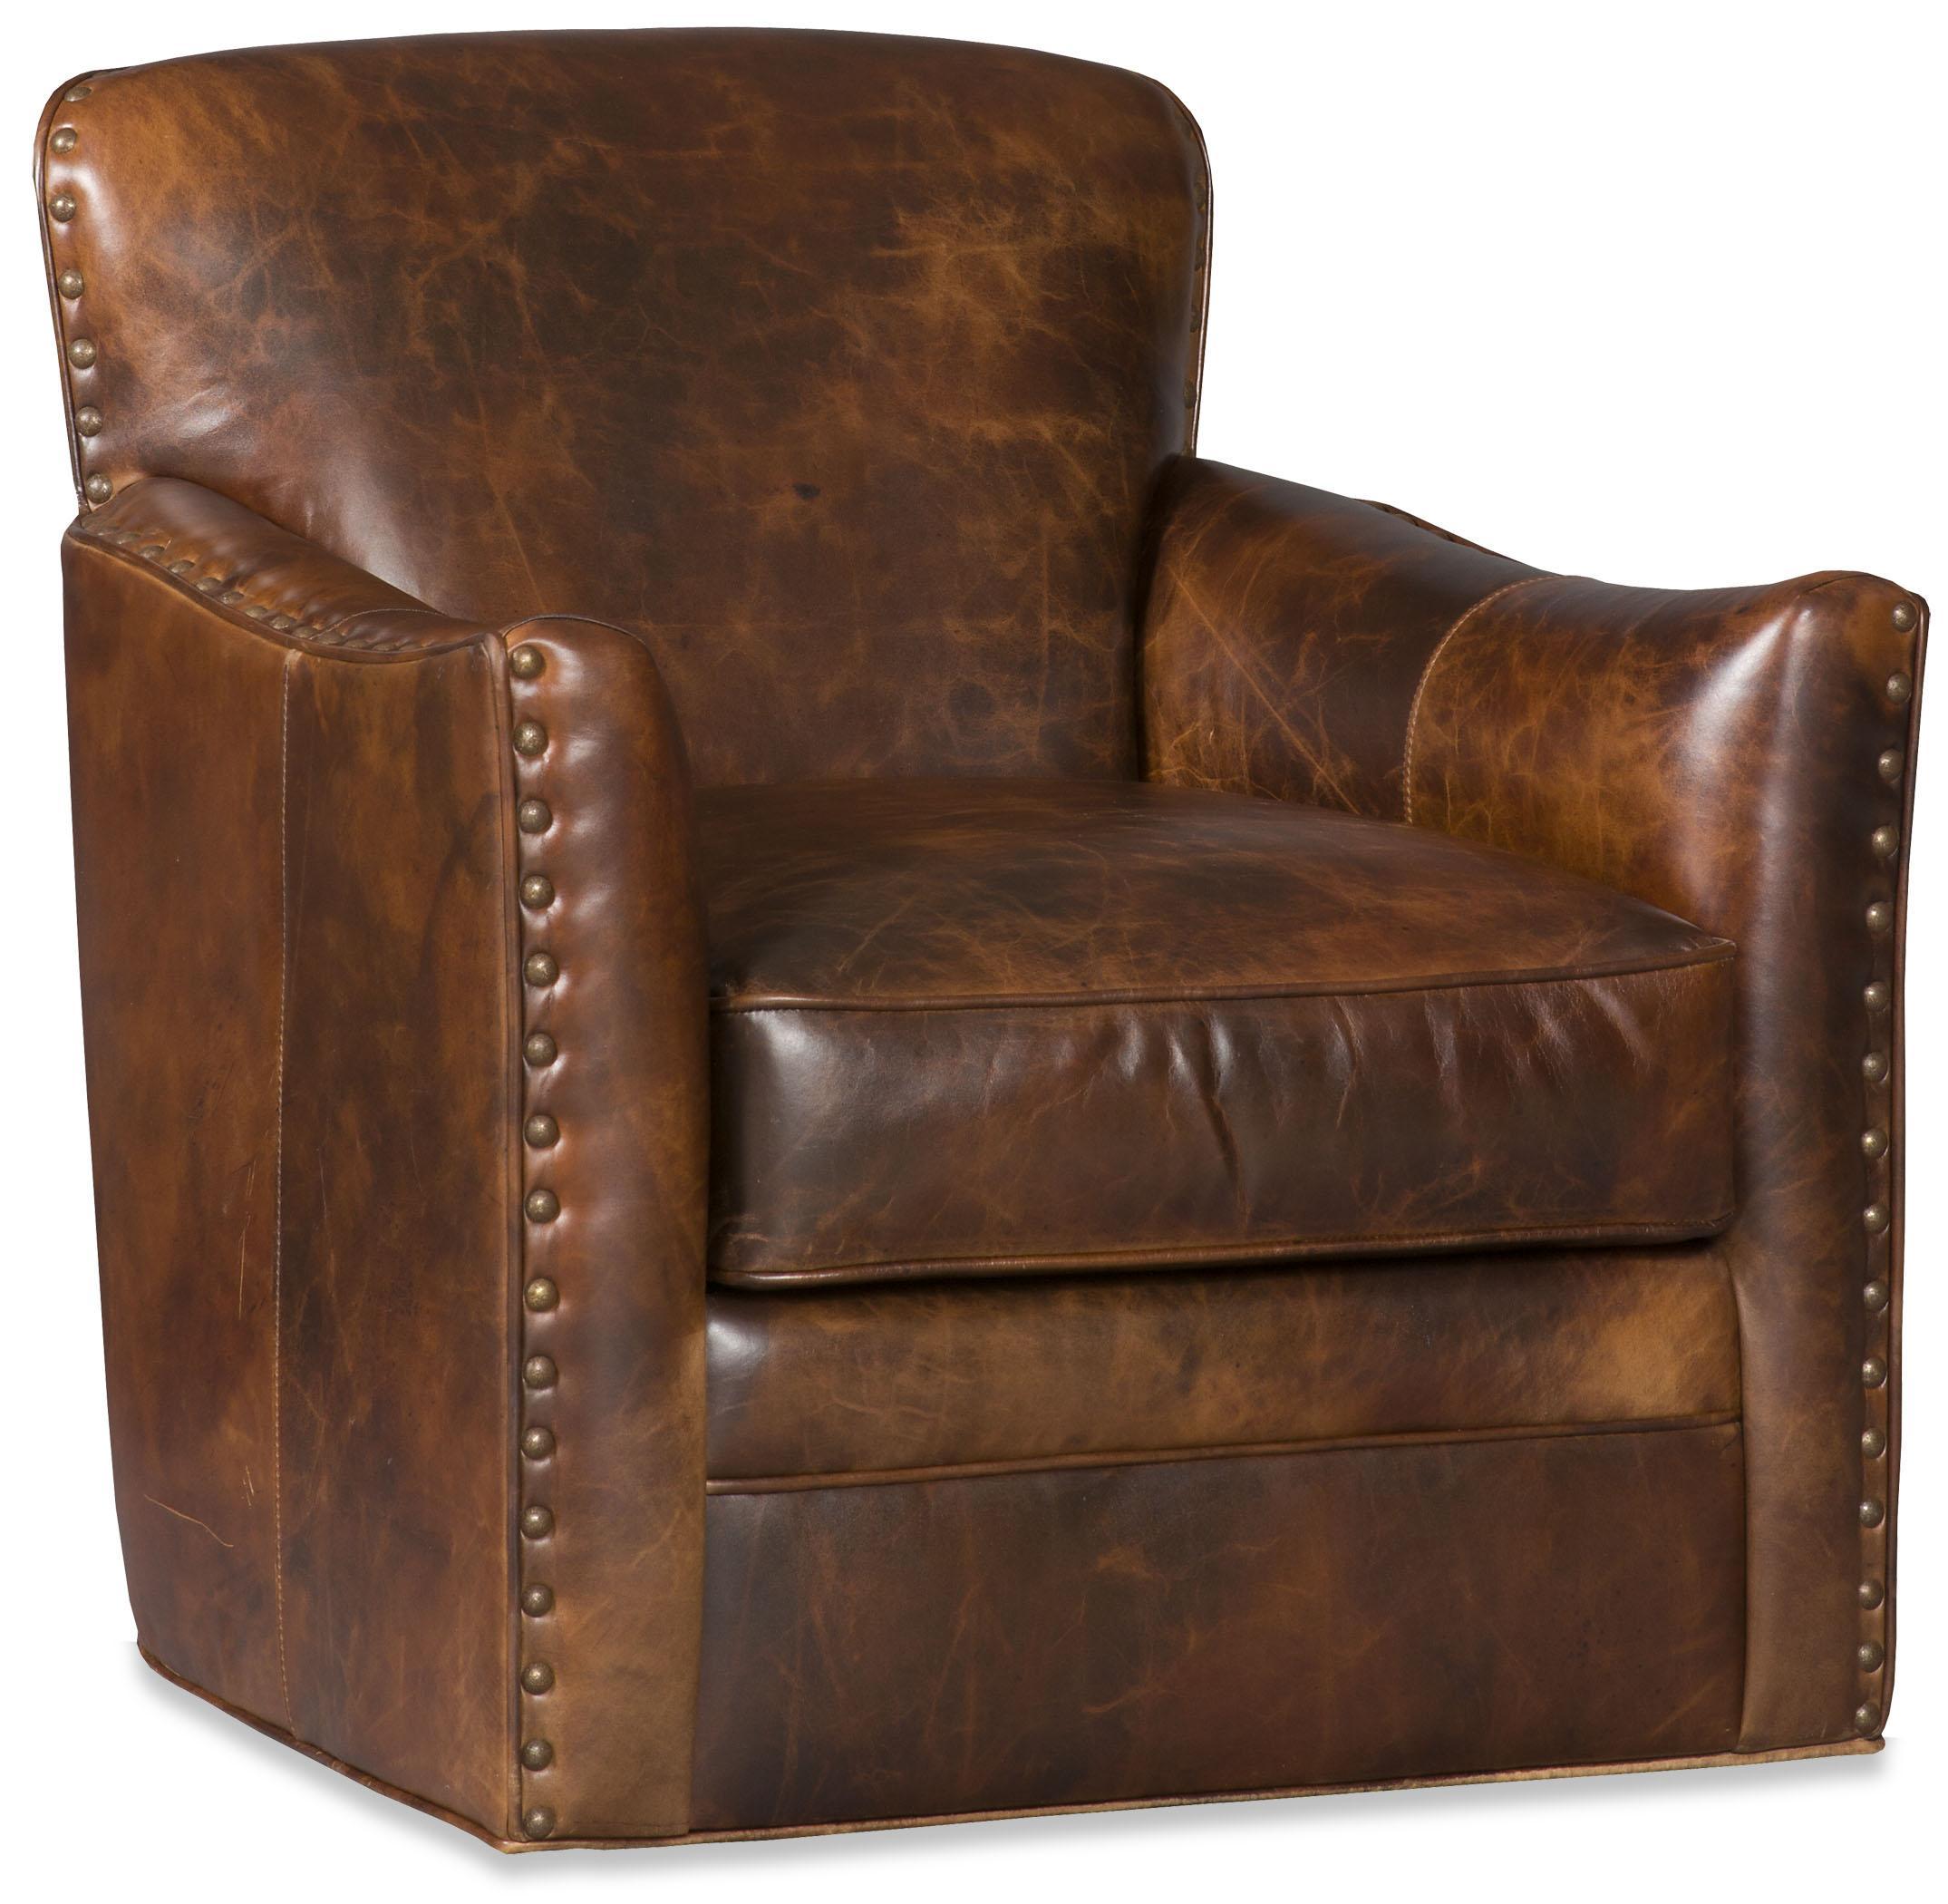 Bradington Young Swivel Tub Chairs Luna Swivel Tub Chair AHFA